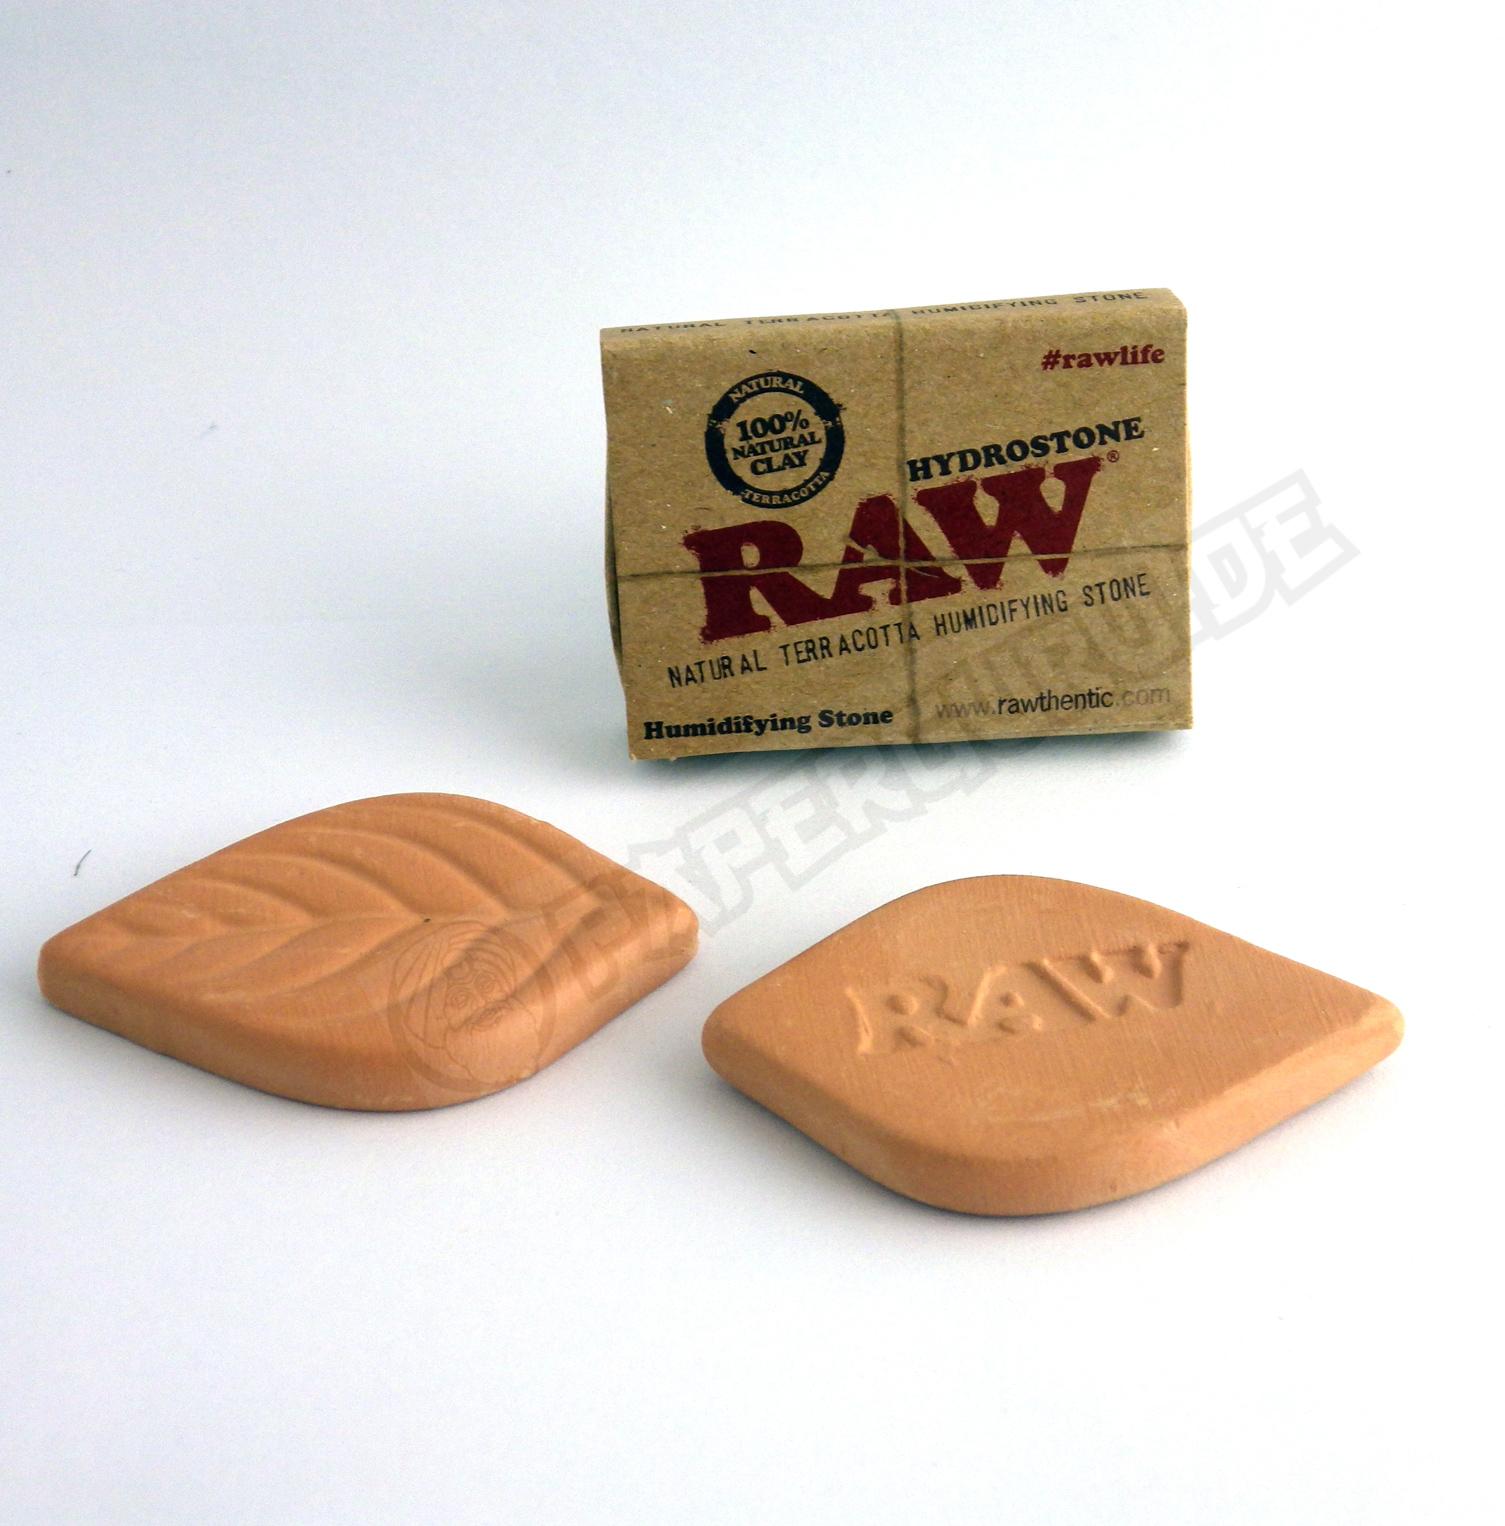 5x raw hydrostone keramikstein tabakbefeuchter terracotta. Black Bedroom Furniture Sets. Home Design Ideas